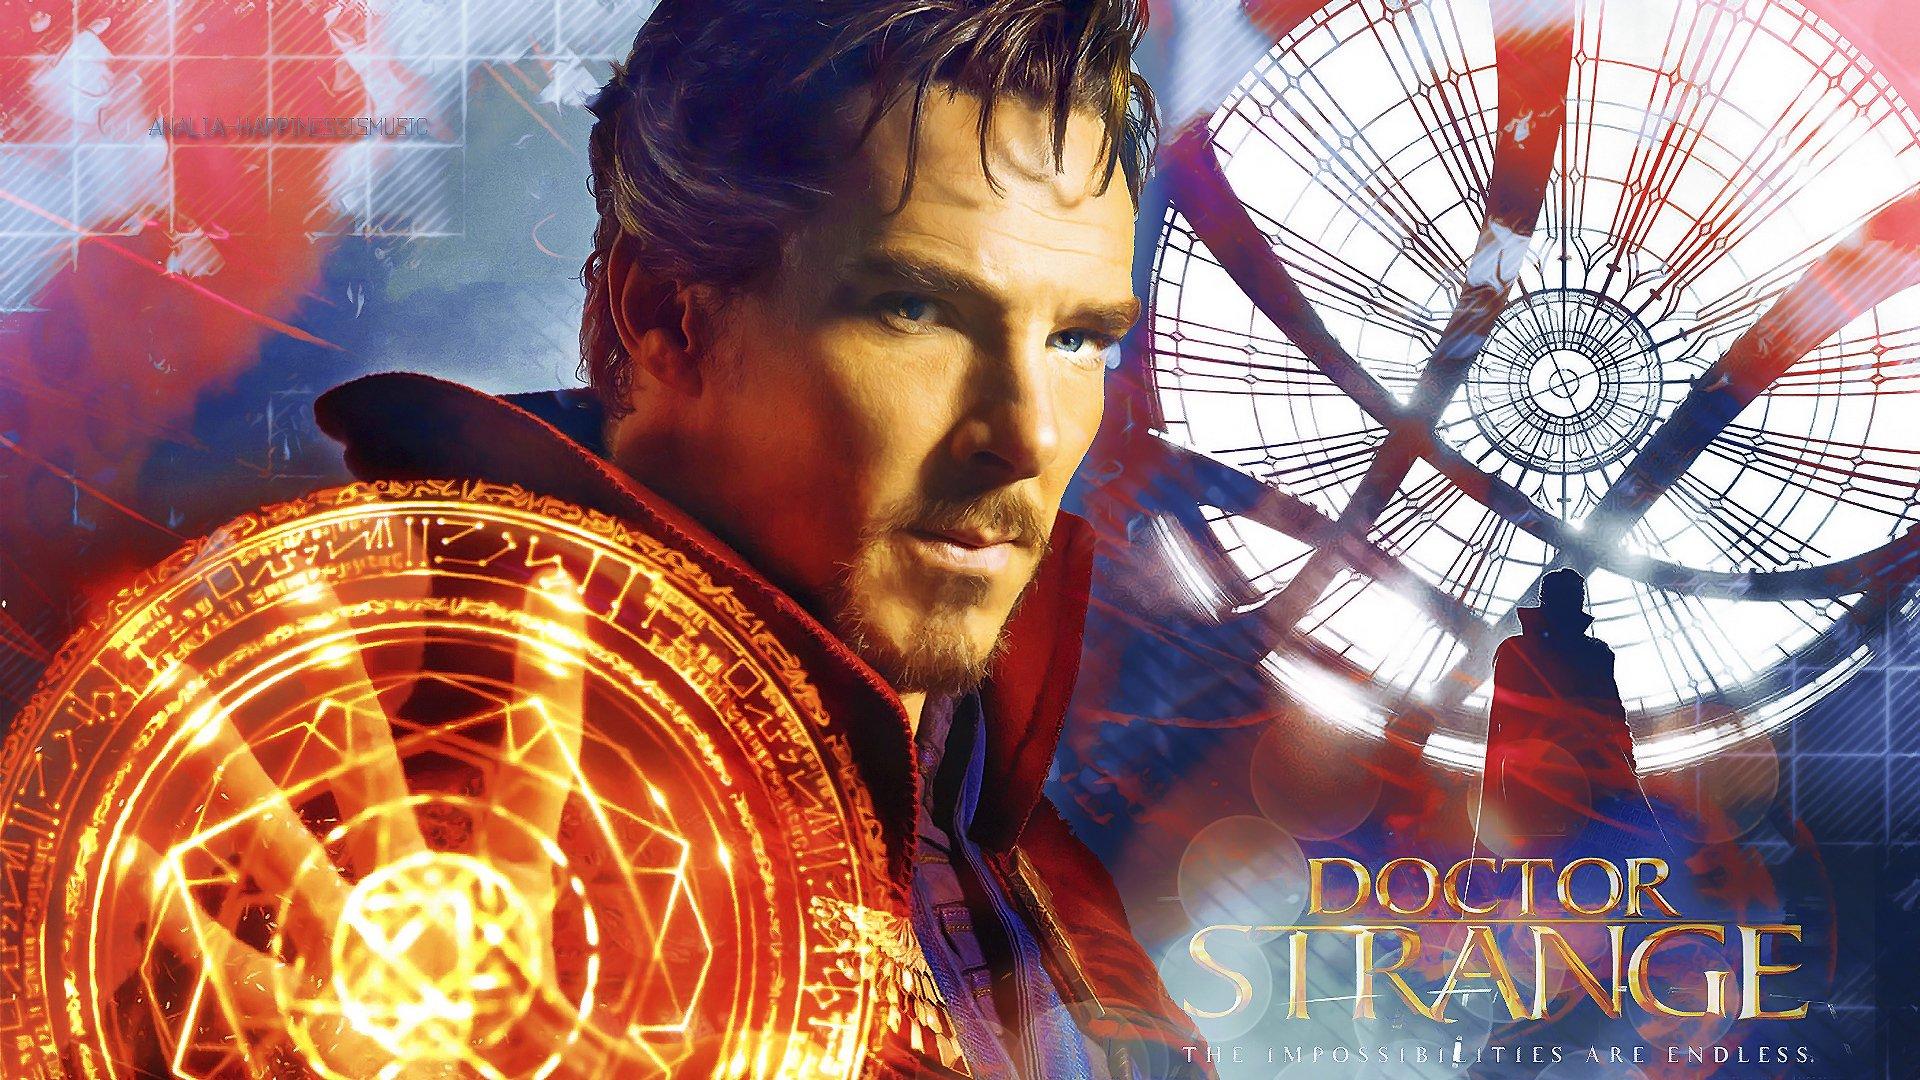 Doctor Strange HD Wallpaper | Background Image | 1920x1080 ...